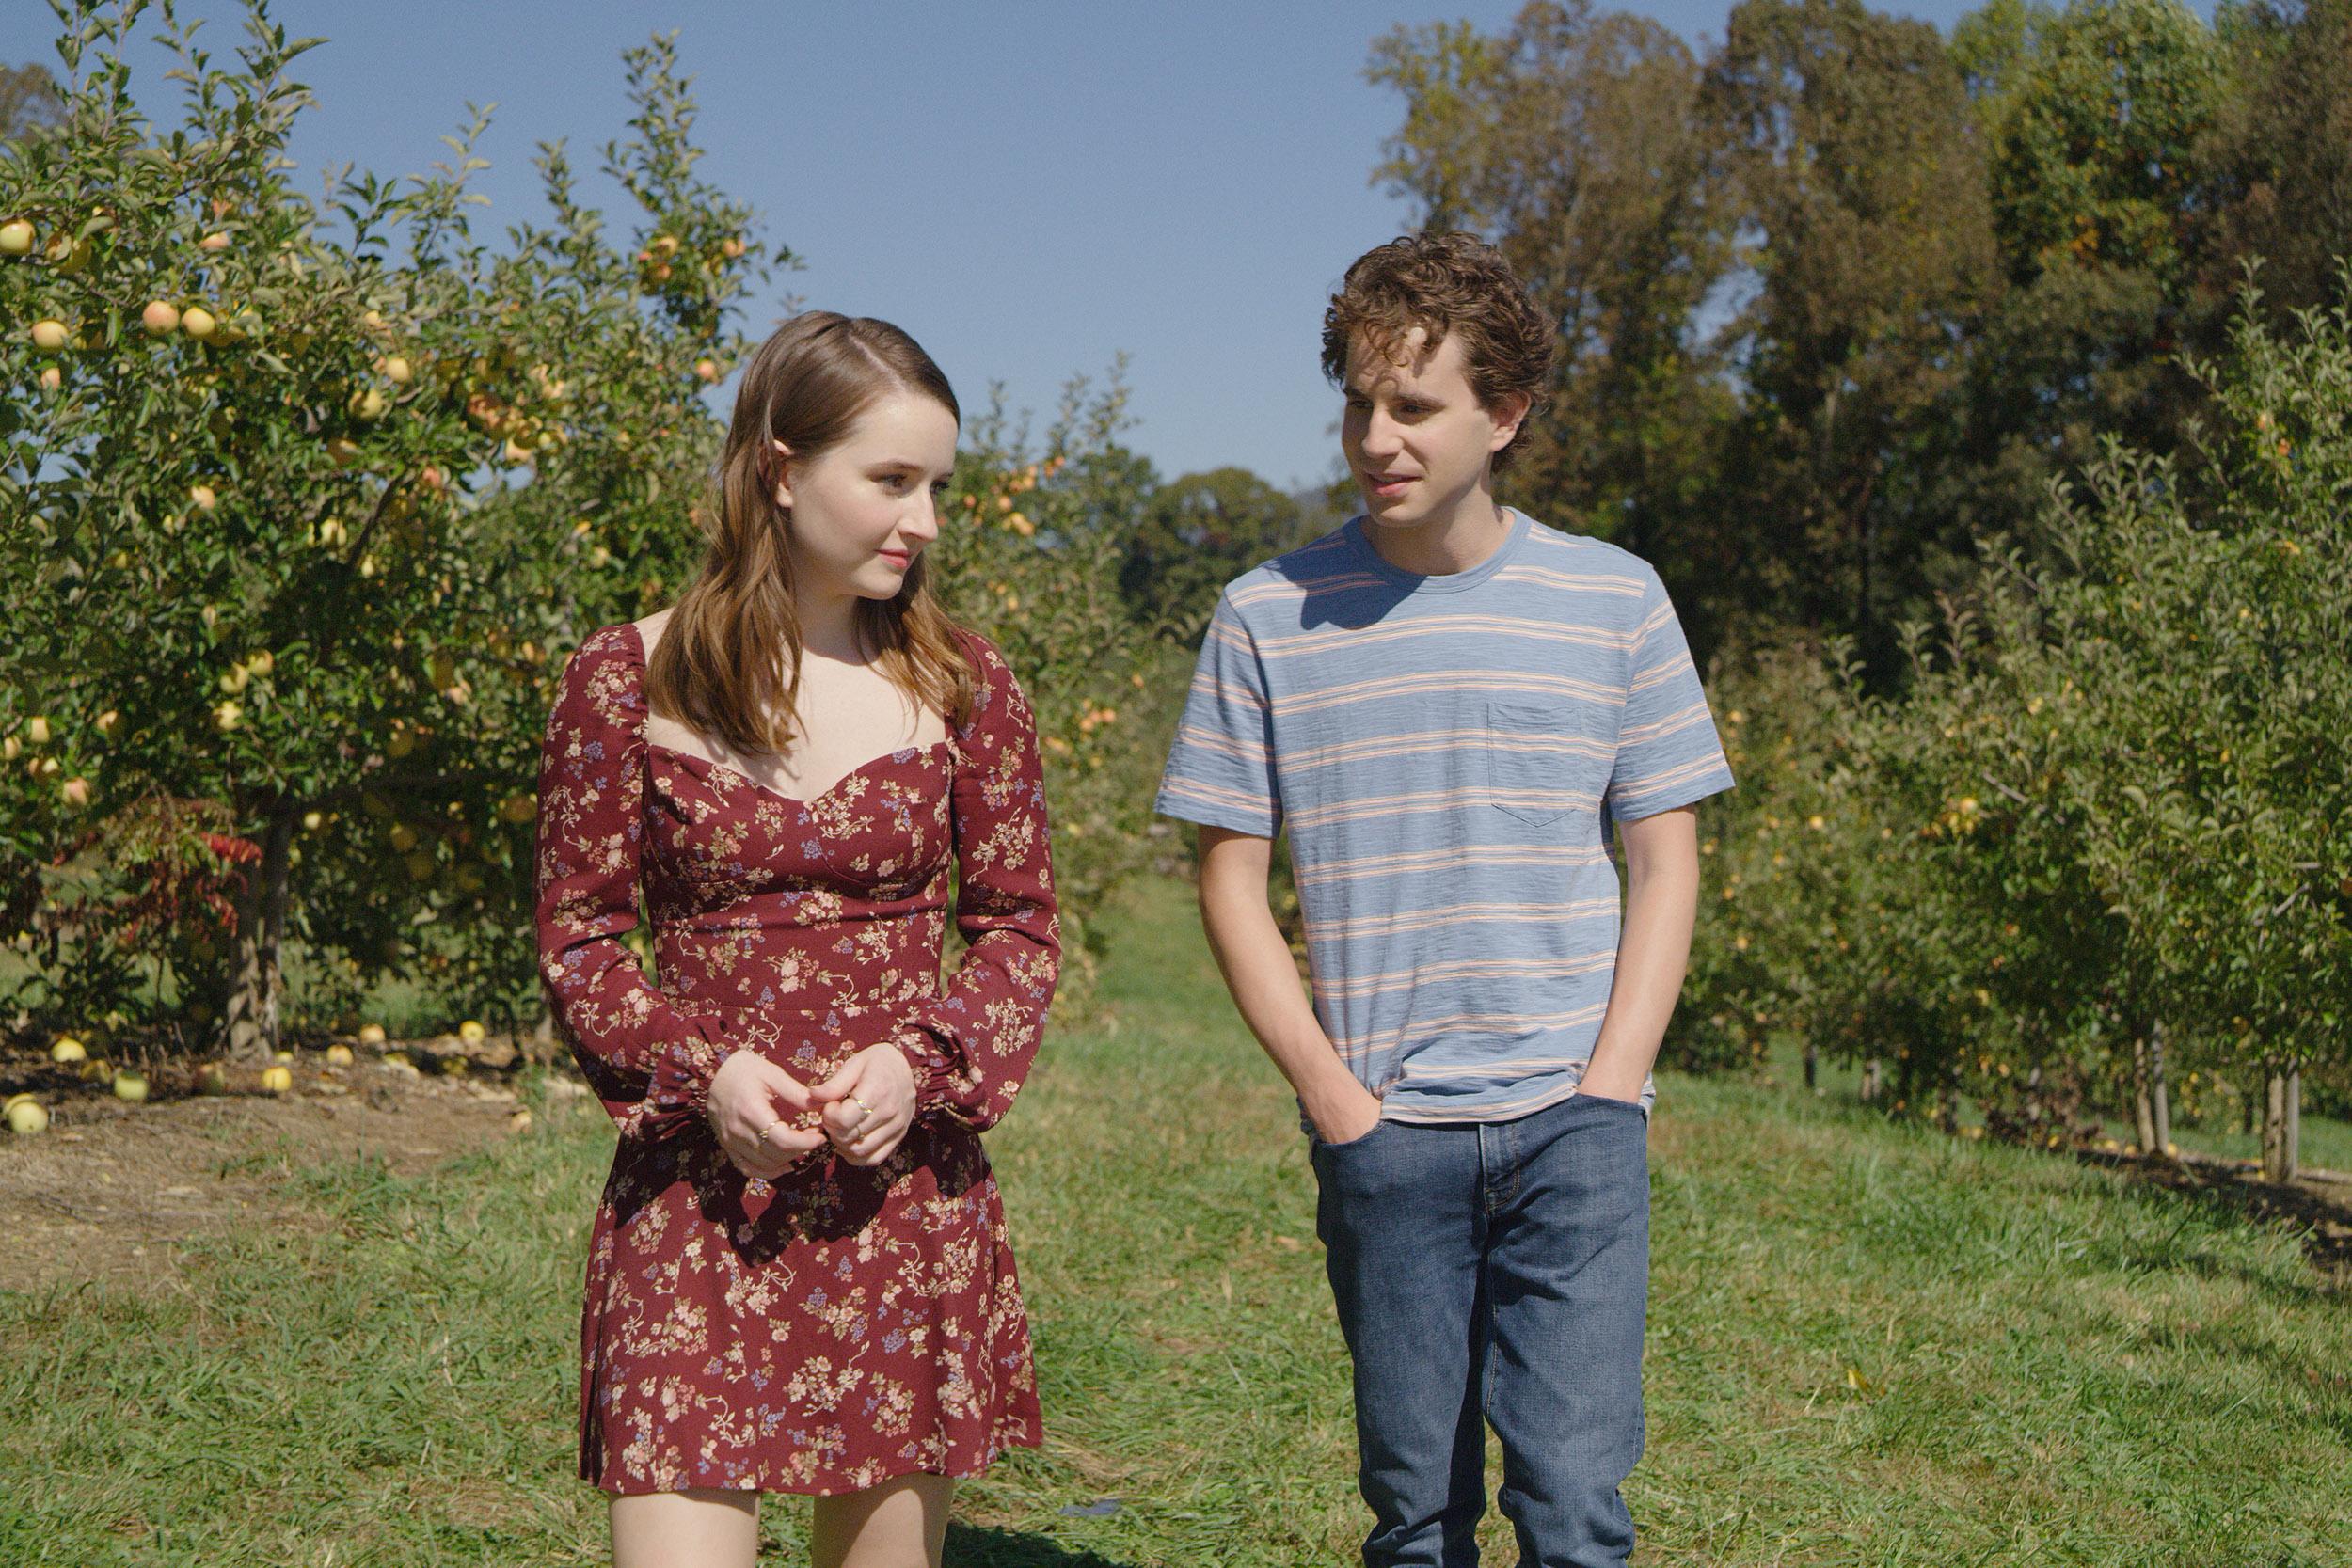 'Dear Evan Hansen' is a vital reminder that good people make bad decisions